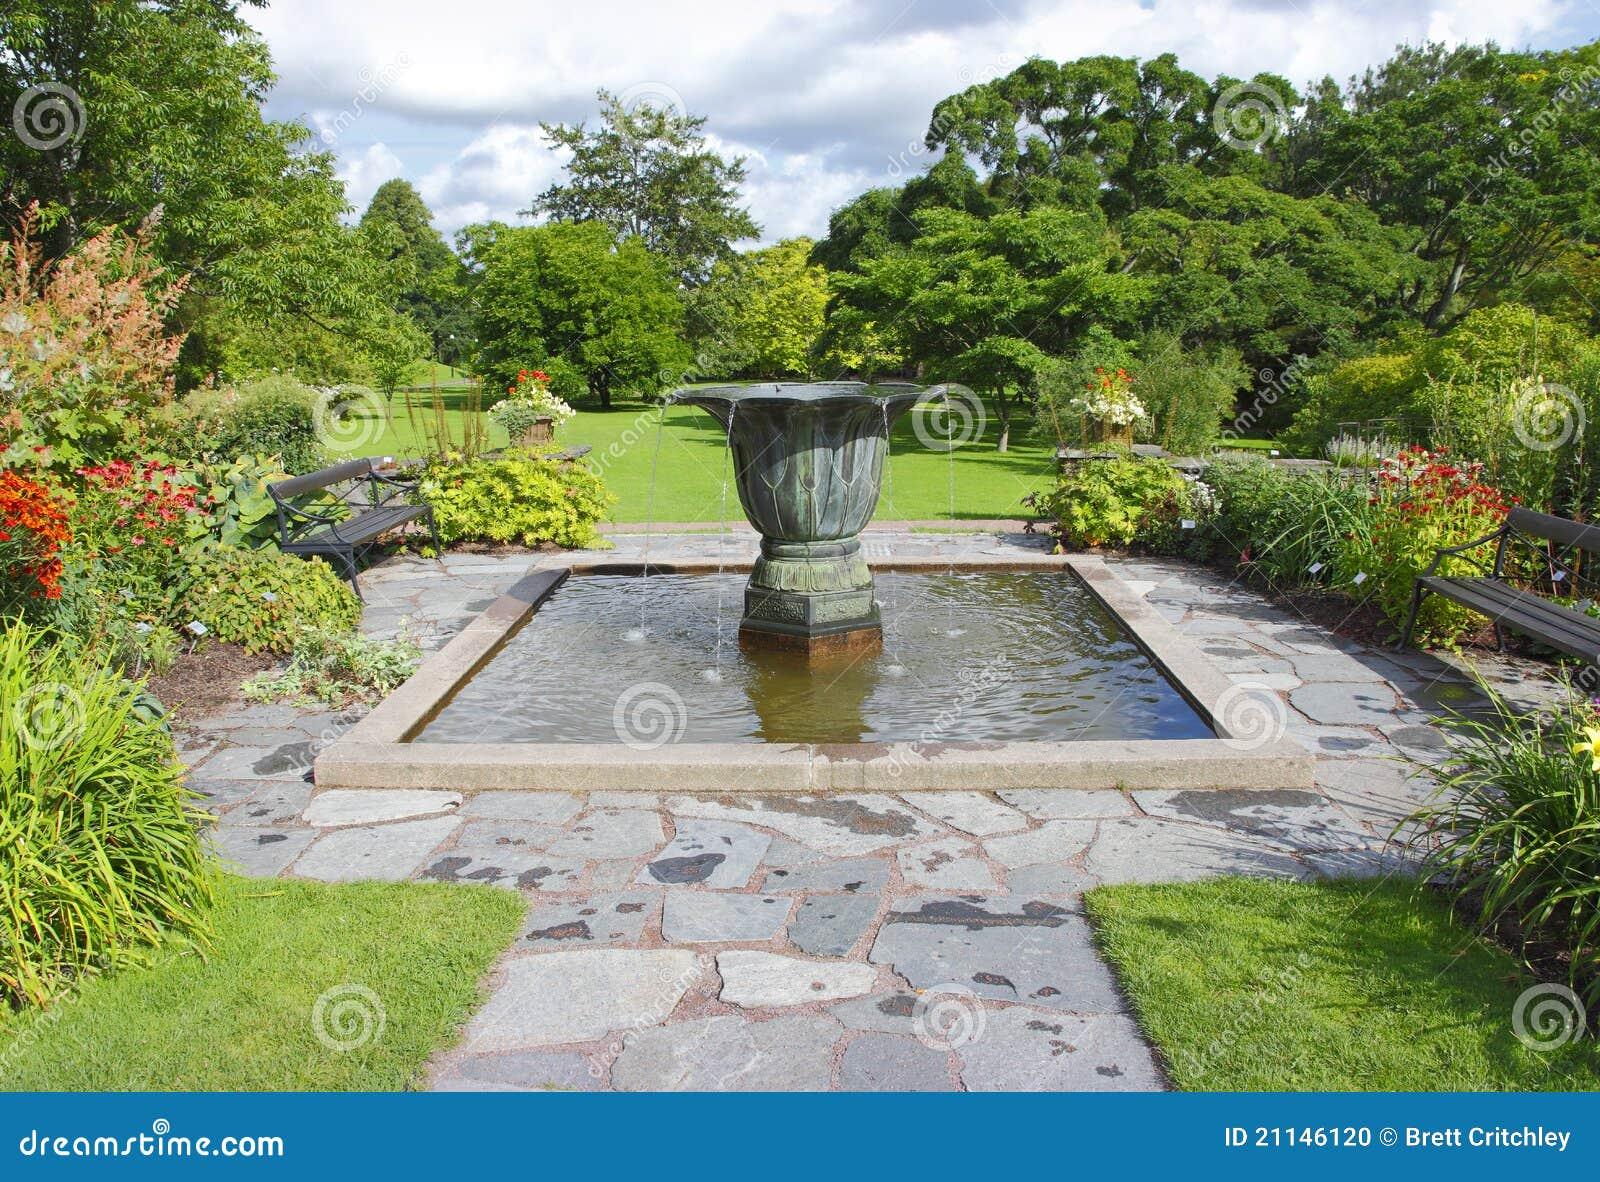 fotos de jardim grande:Grande jardim com fonte